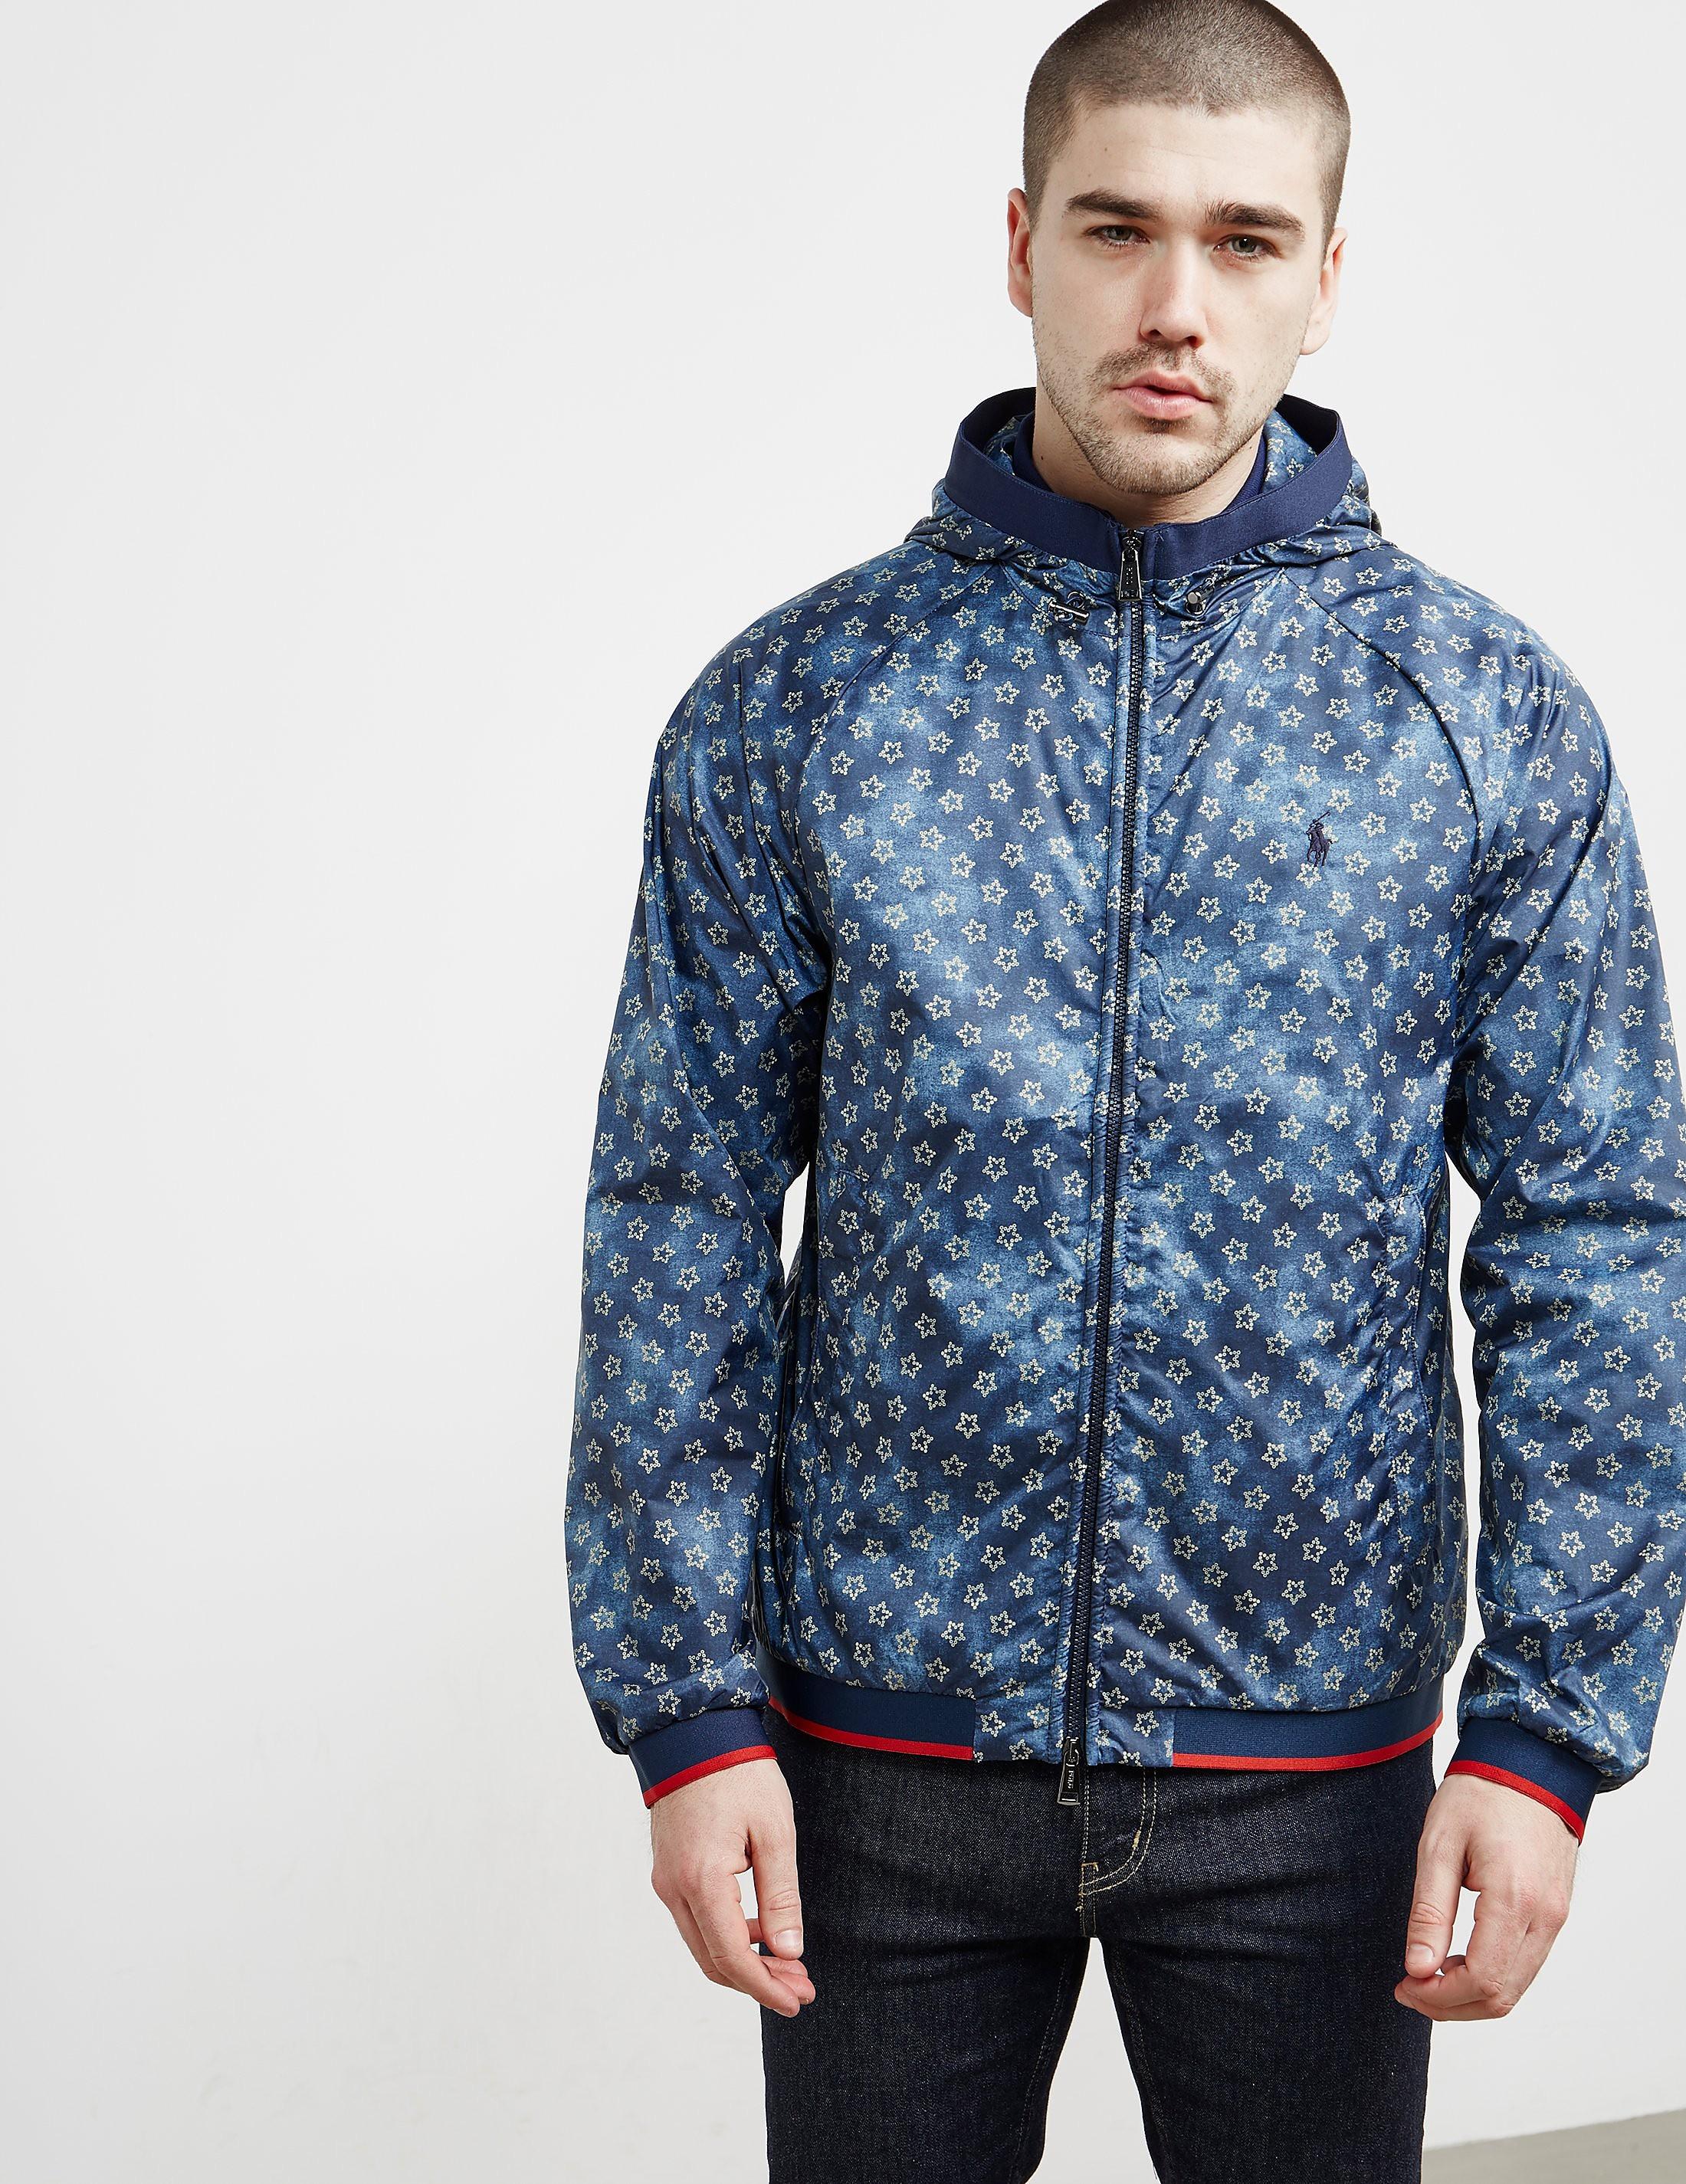 Polo Ralph Lauren Windbreaker Jacket